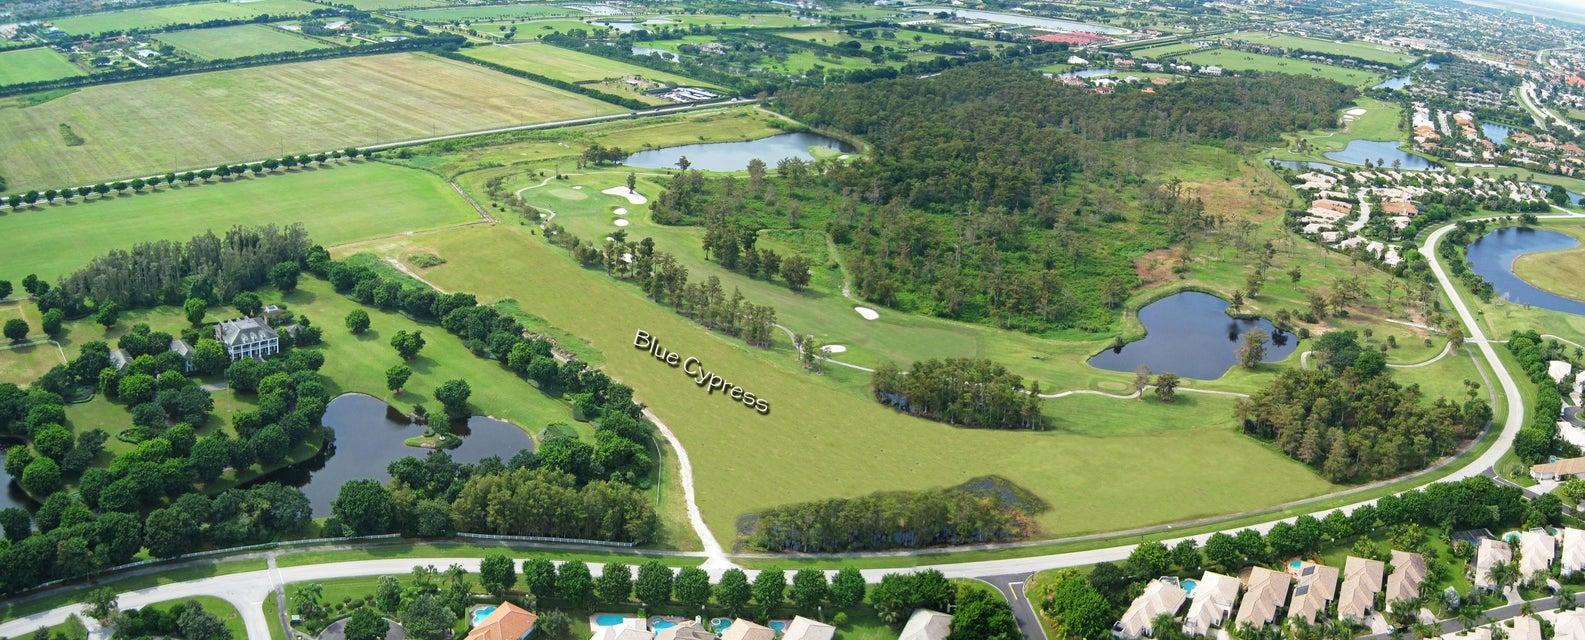 Single Family Home for Sale at 3077 Blue Cypress Lane 3077 Blue Cypress Lane Wellington, Florida 33414 United States